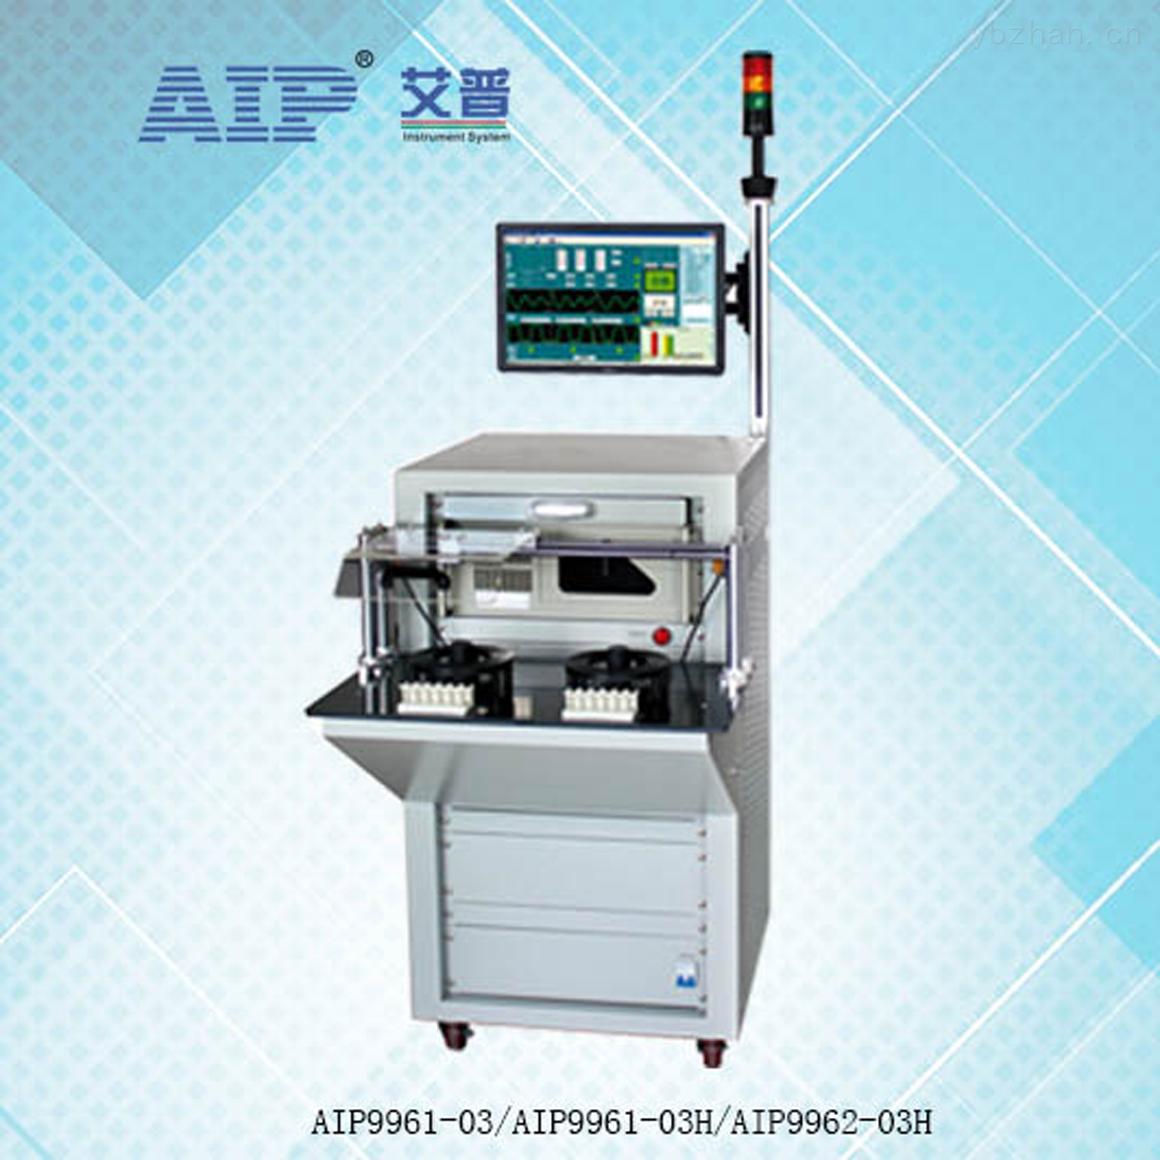 AIP9961-03-單相電機定子綜合測試系統